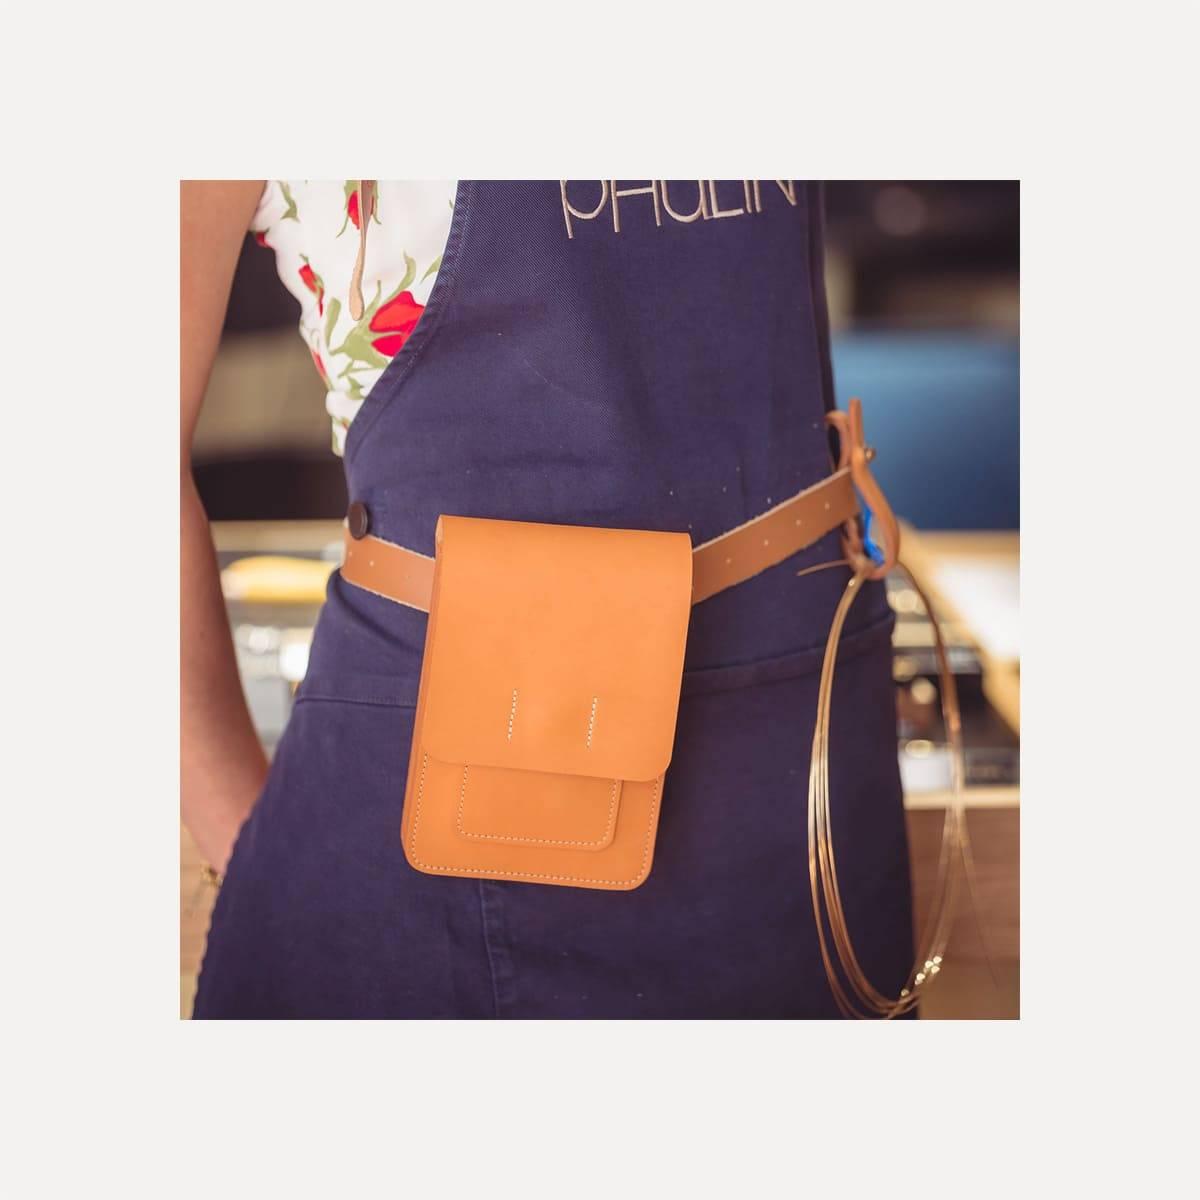 Jeweler's bag - BDC x Atelier Paulin (image n°12)